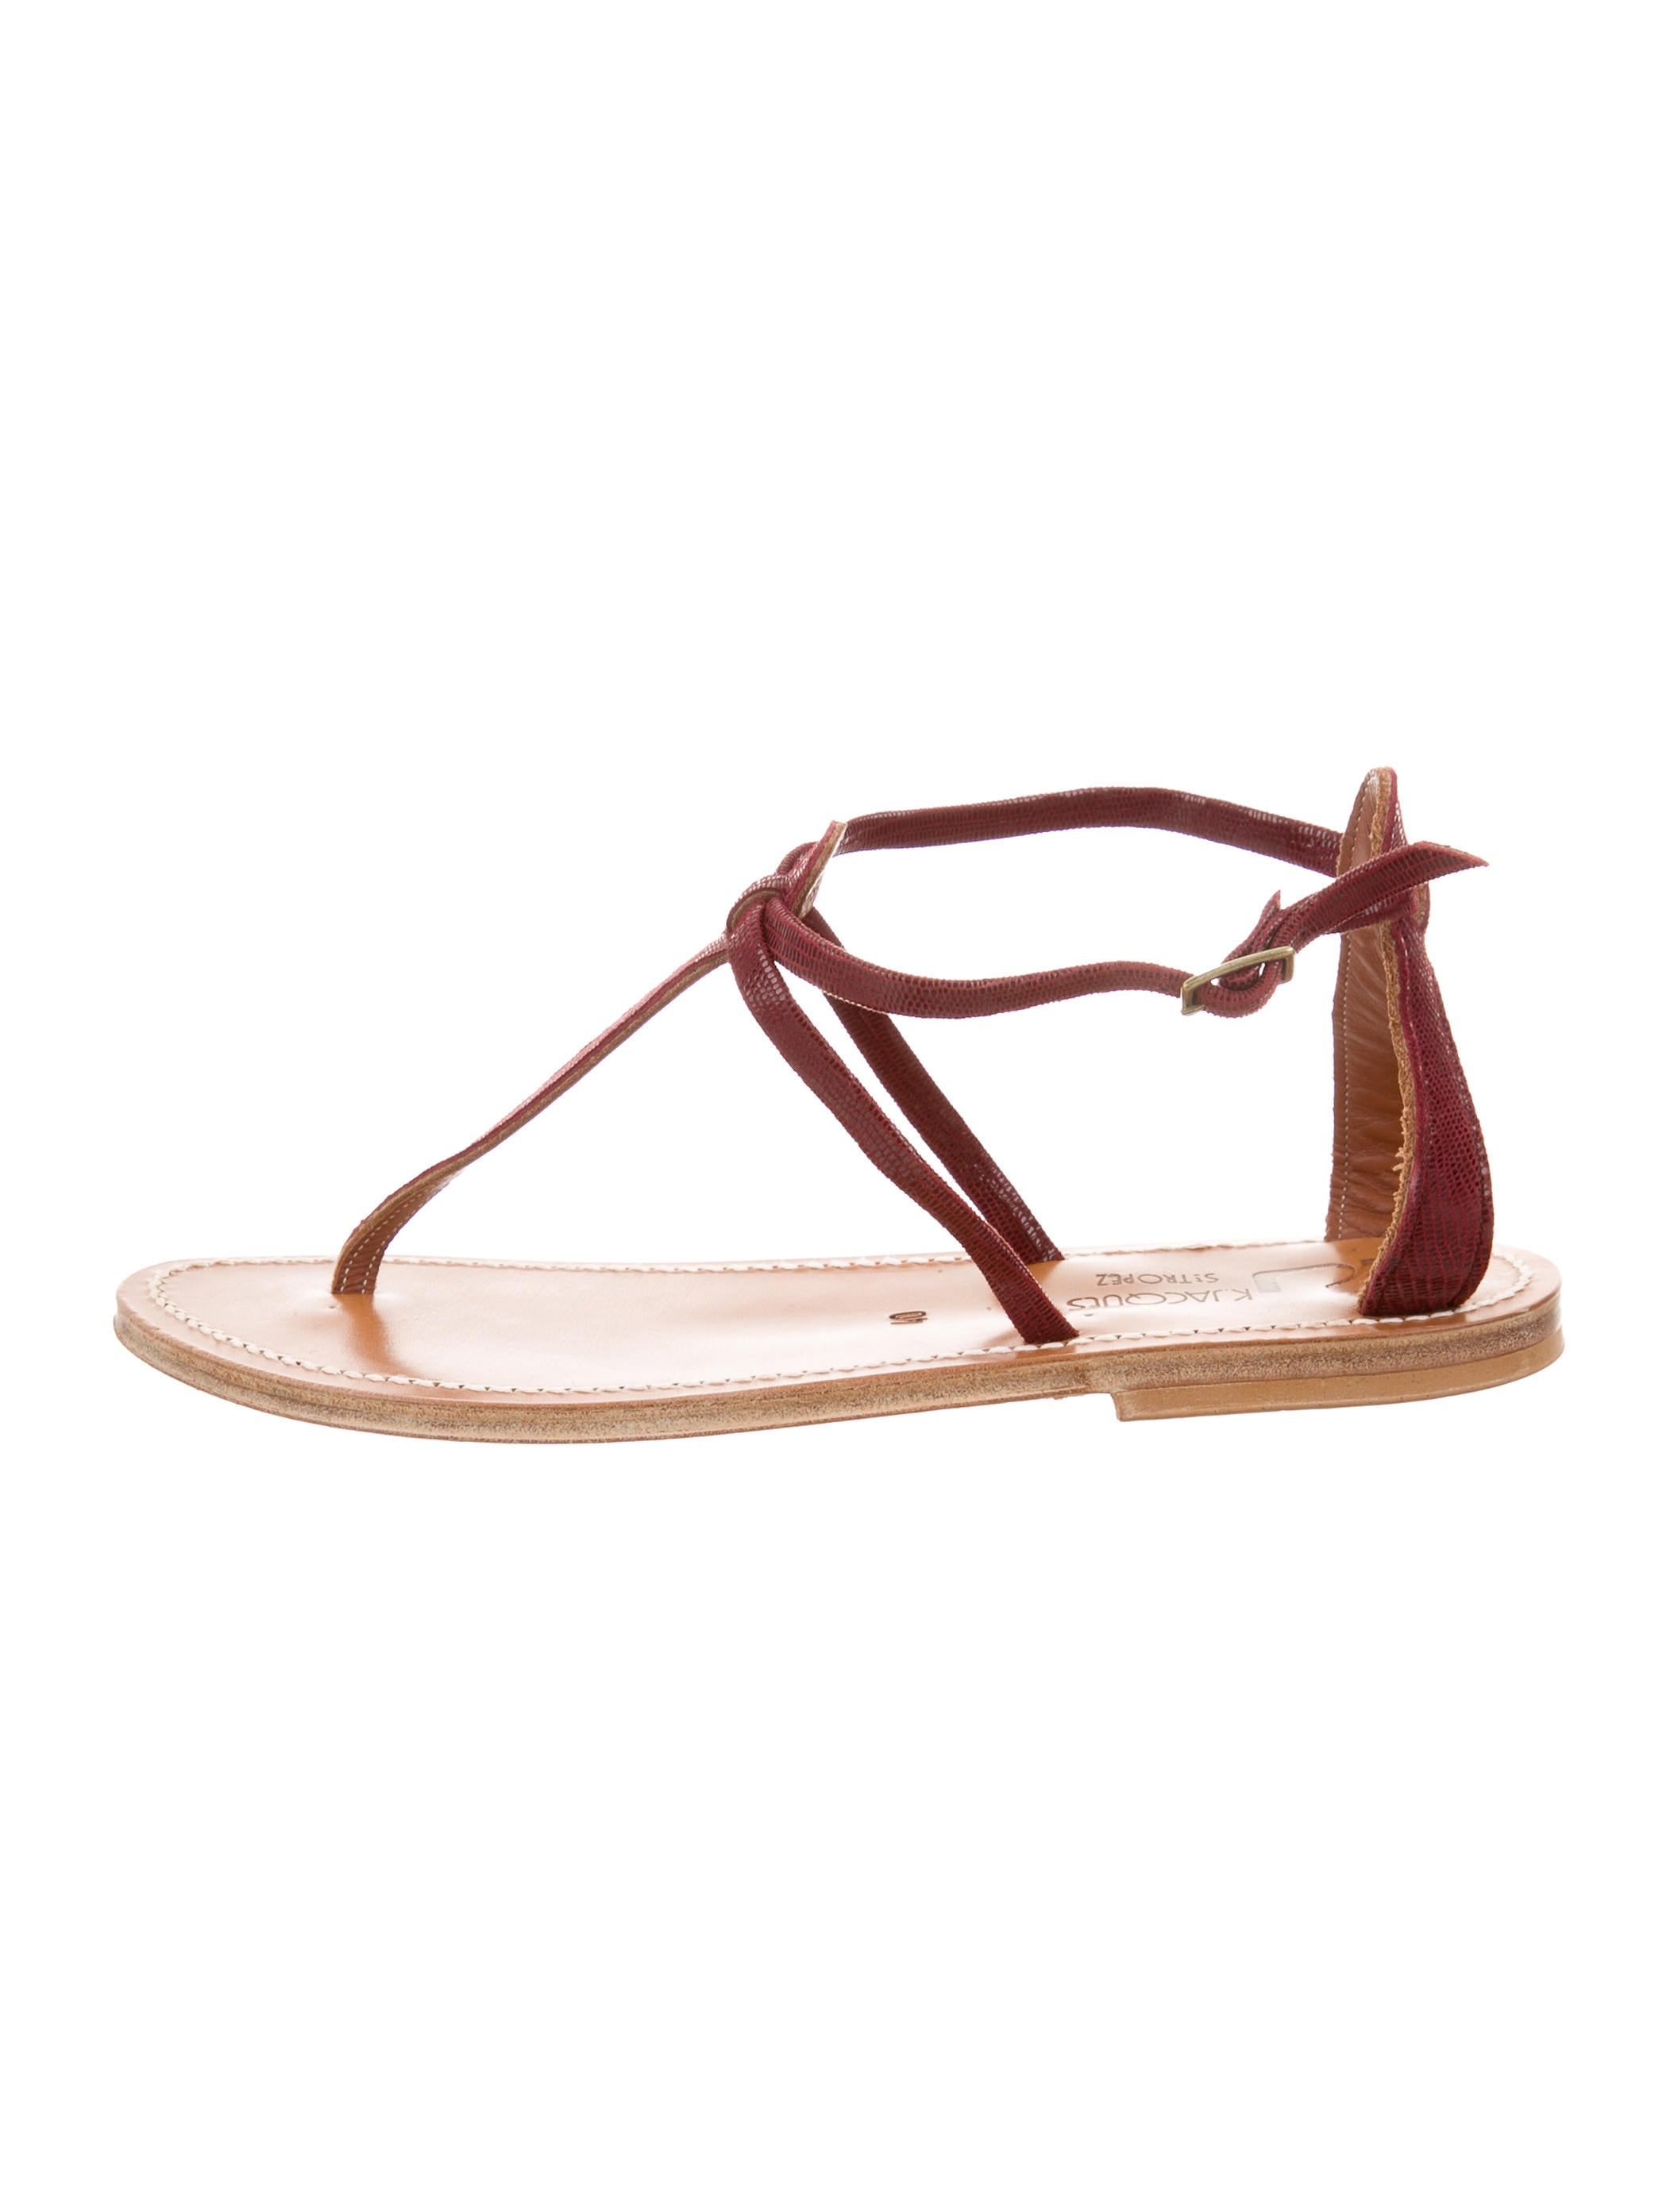 7727919e570c K Jacques St. Tropez Embossed Thong Sandals - Shoes - WK021166